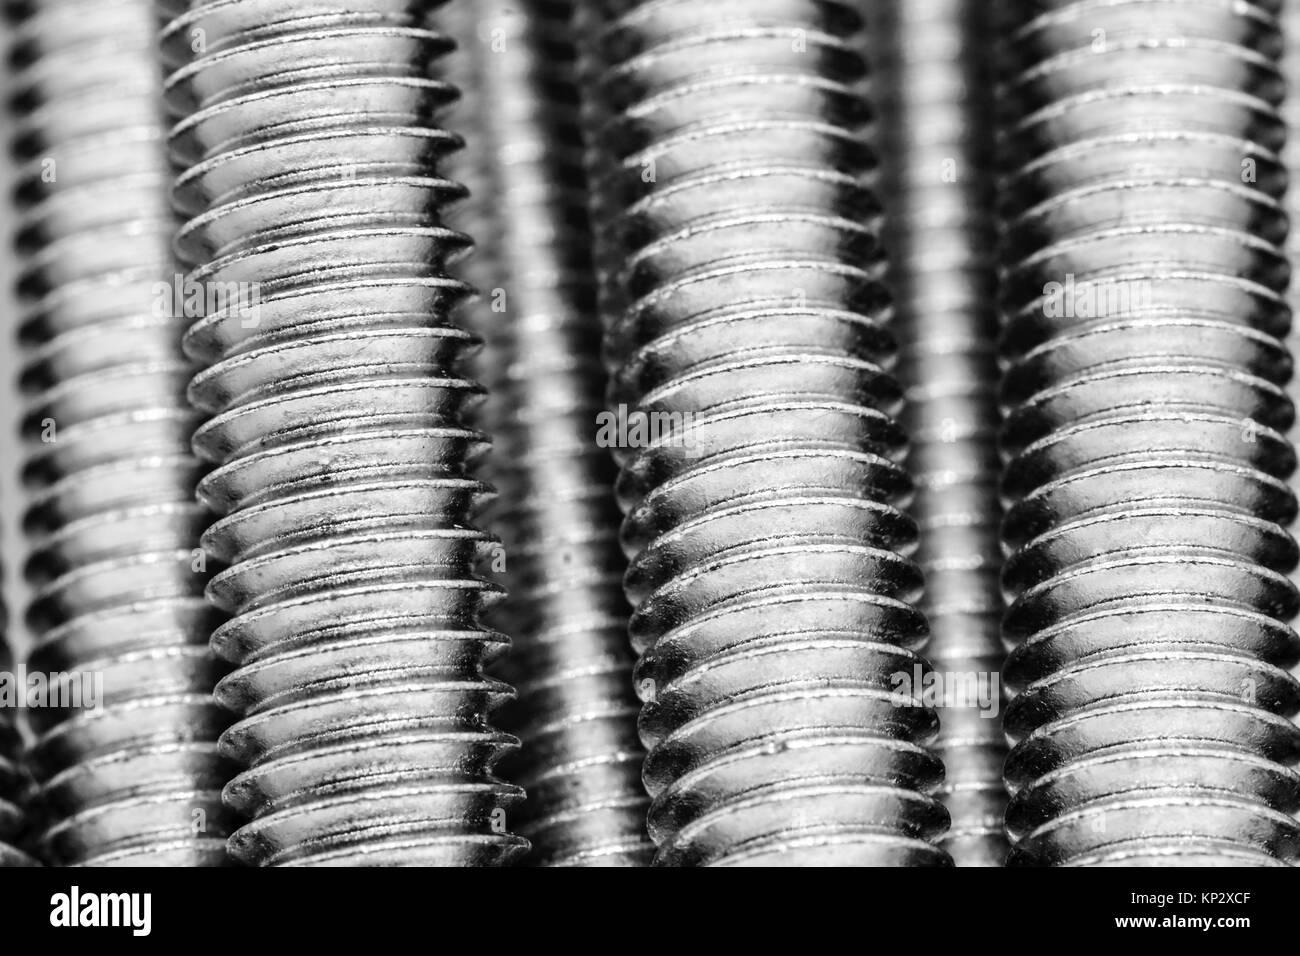 Macro of silver screws - Stock Image